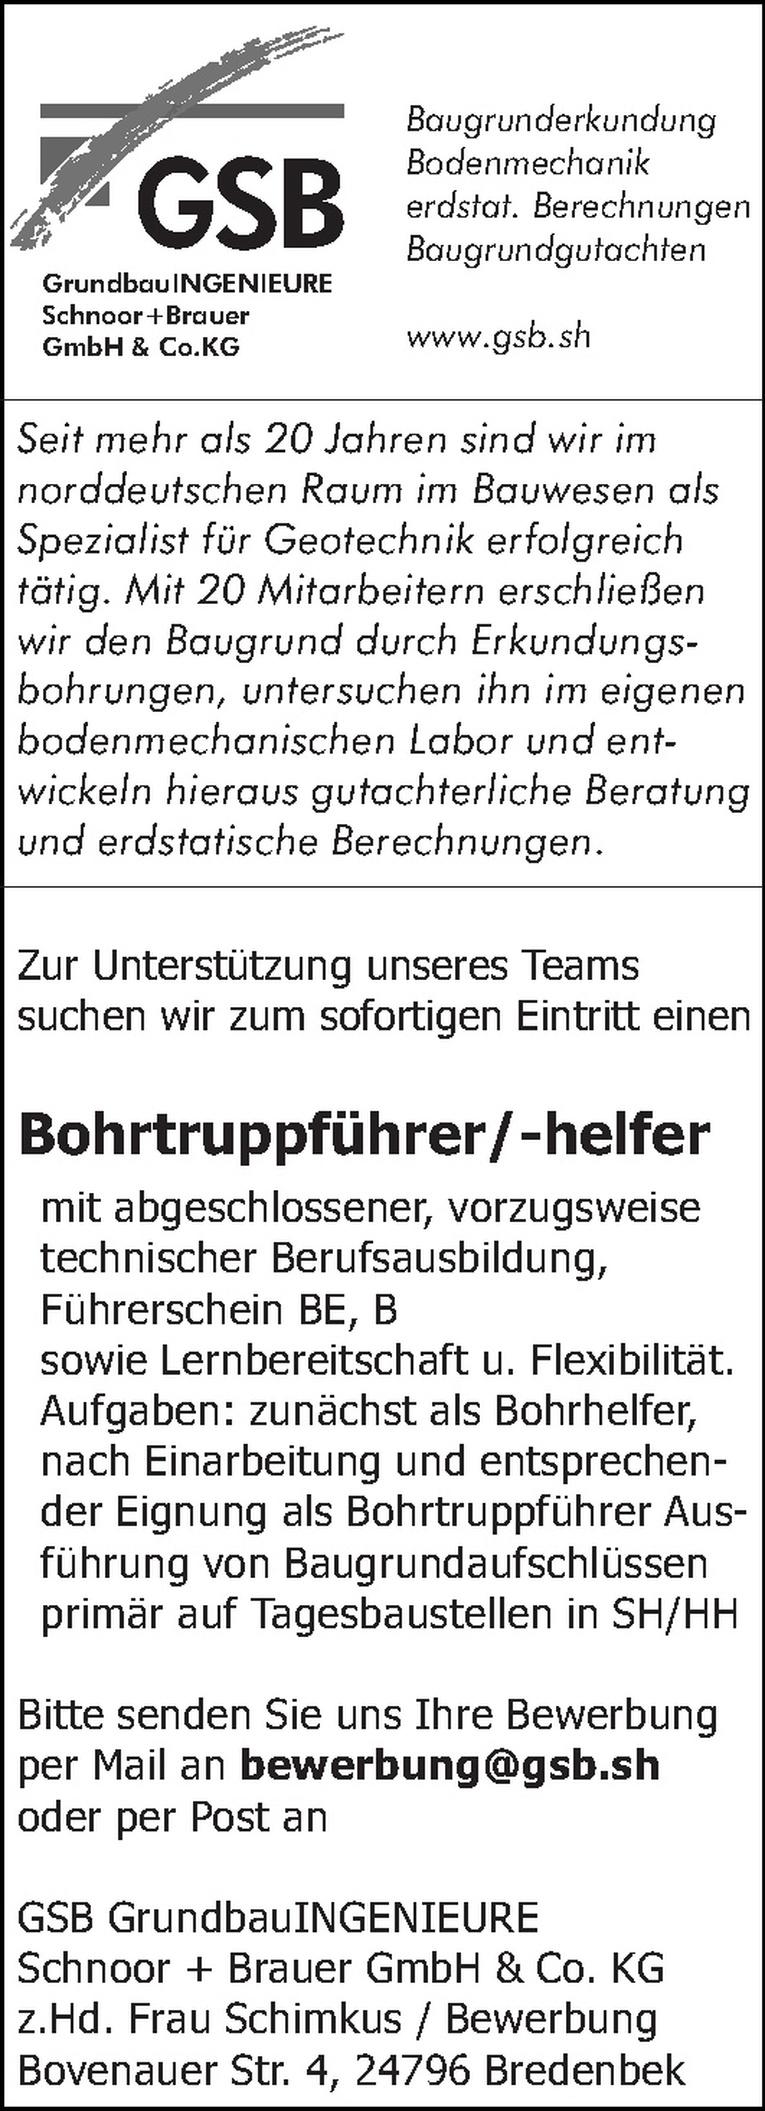 Bohrtruppführer/-helfer